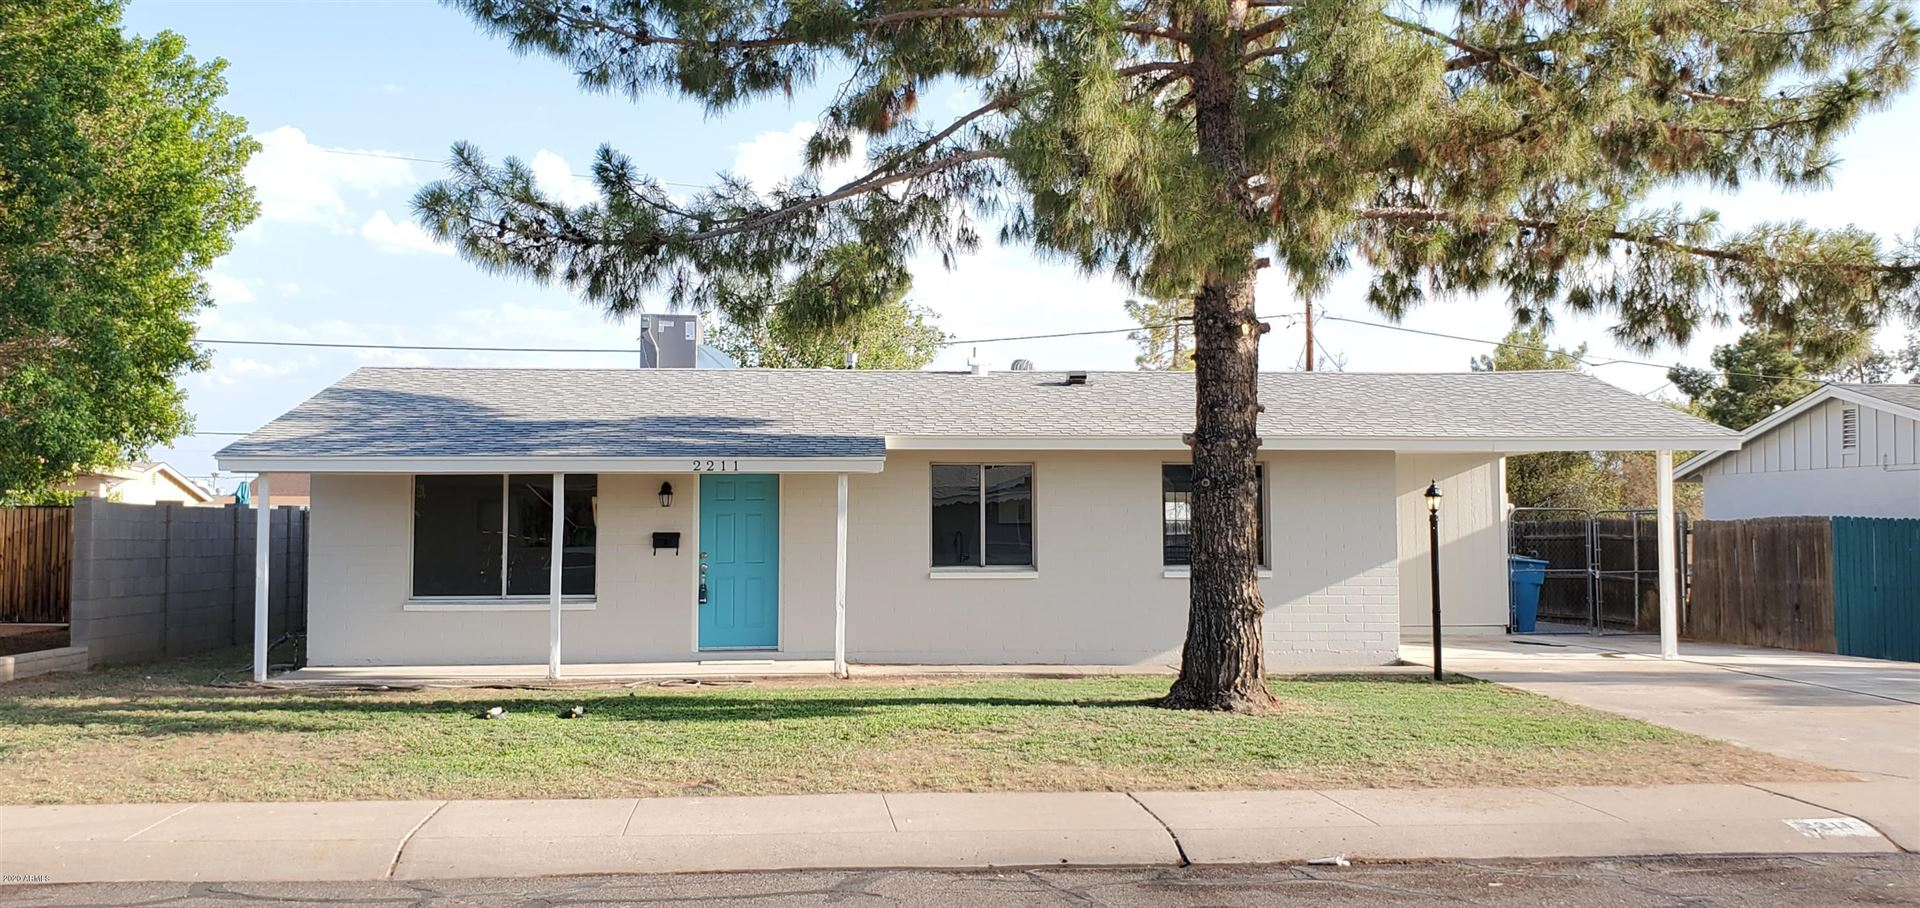 2211 W LAUREL Lane, Phoenix, AZ 85029 - MLS#: 6136035